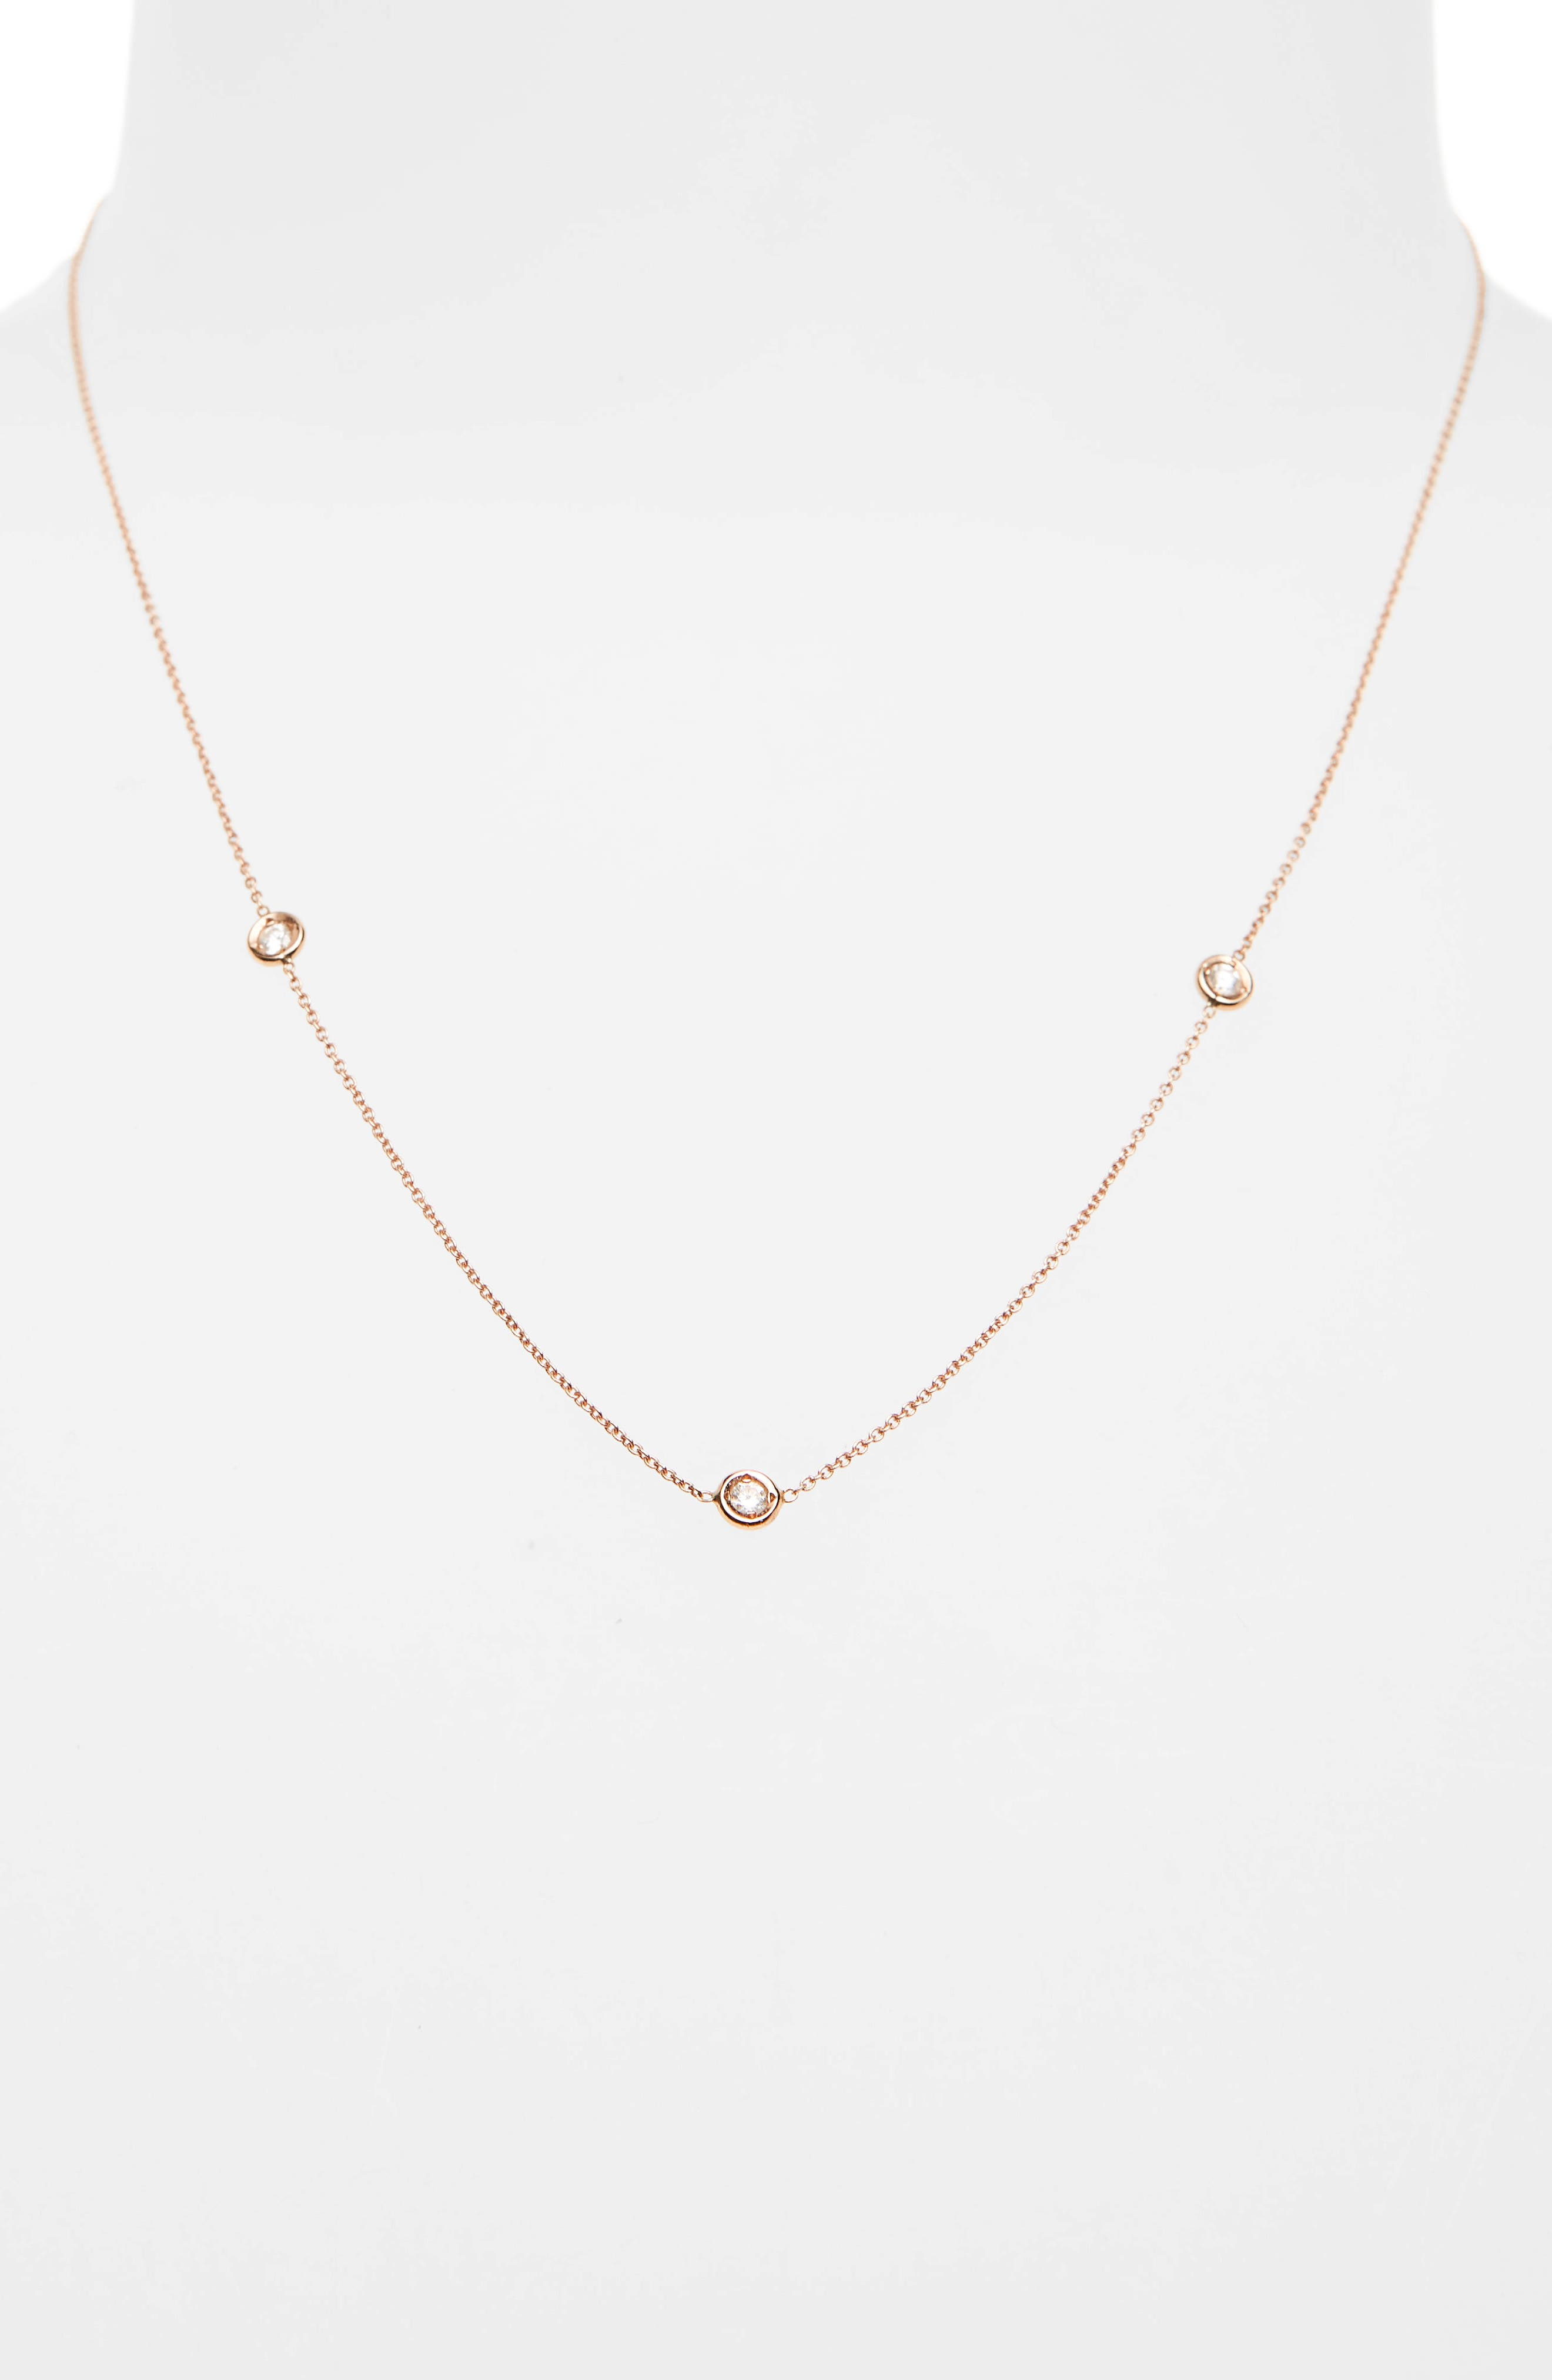 3-Station Diamond Necklace,                             Alternate thumbnail 2, color,                             Rose Gold